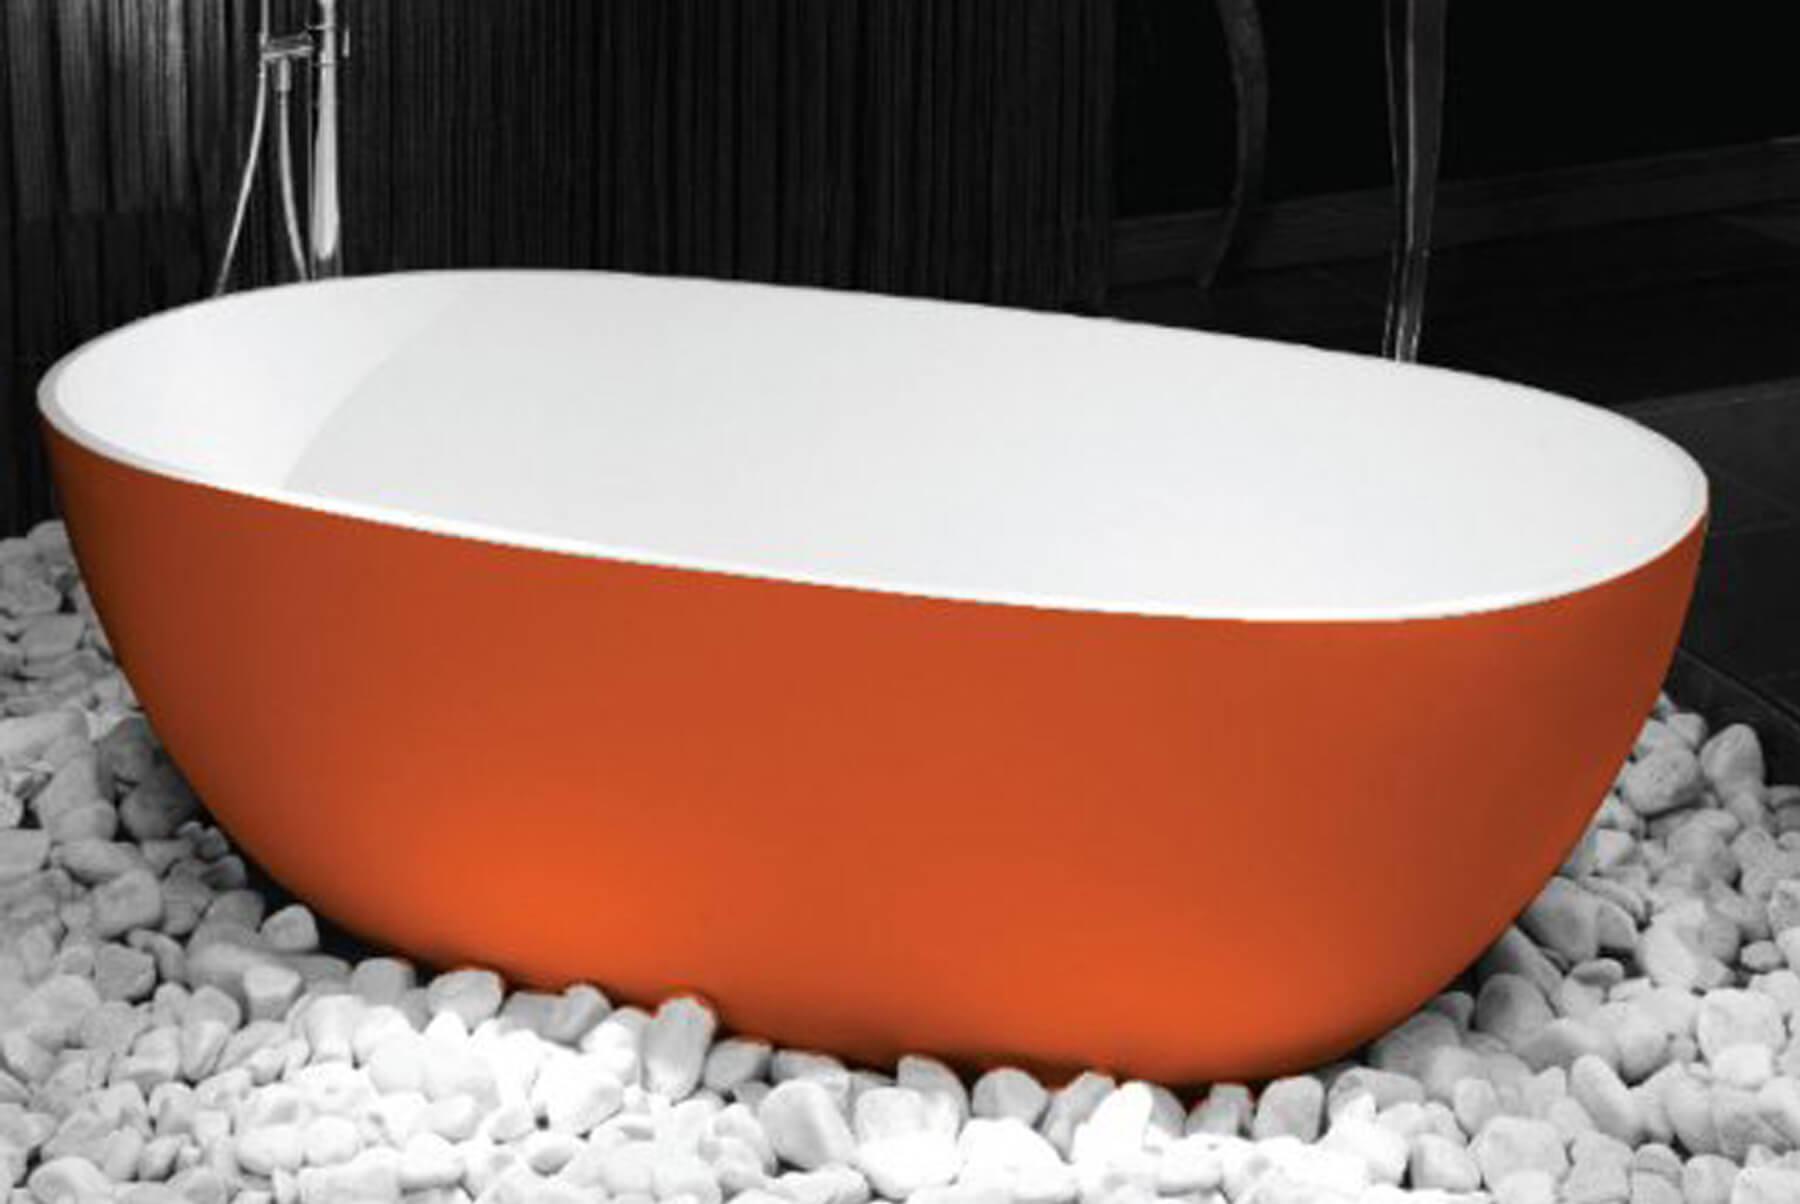 Bath-Tubs-WATERS-CLOUD-BATH-TUB-ORANGE-1800x1204